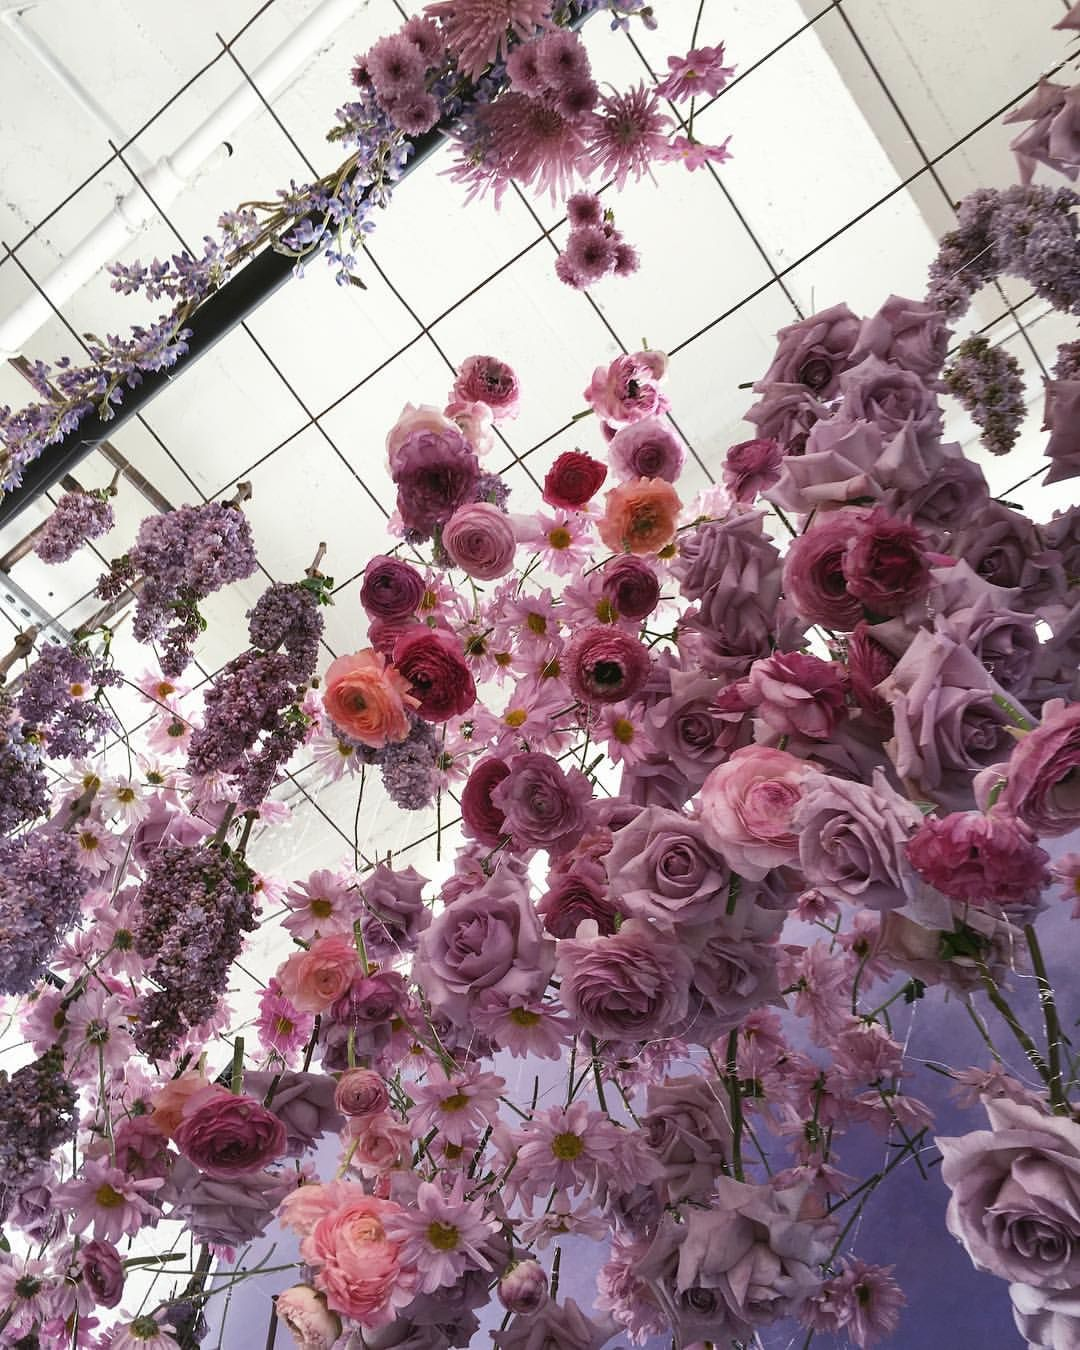 3,796 Likes, 46 Comments - floral installation JENN SANCHEZ (@jennchezdesign)